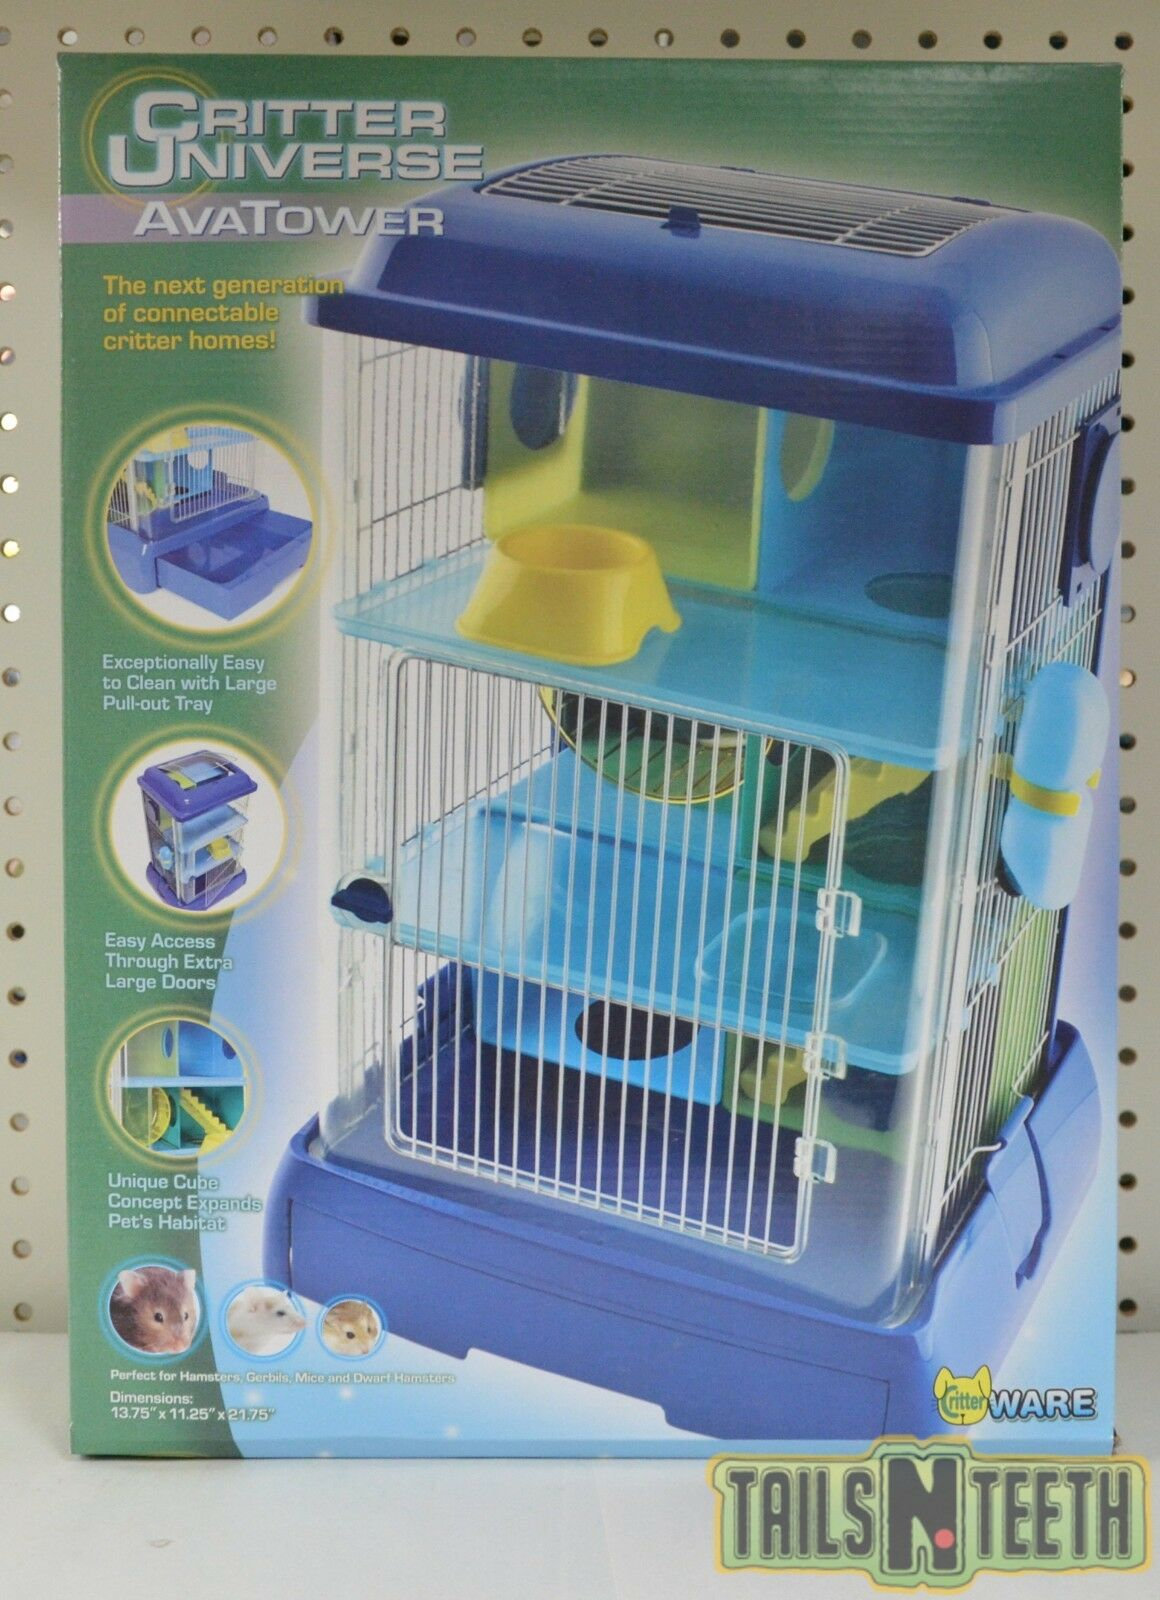 CritterWare Critter Universe AvaTower - Multi-Layer Home for Small Animals